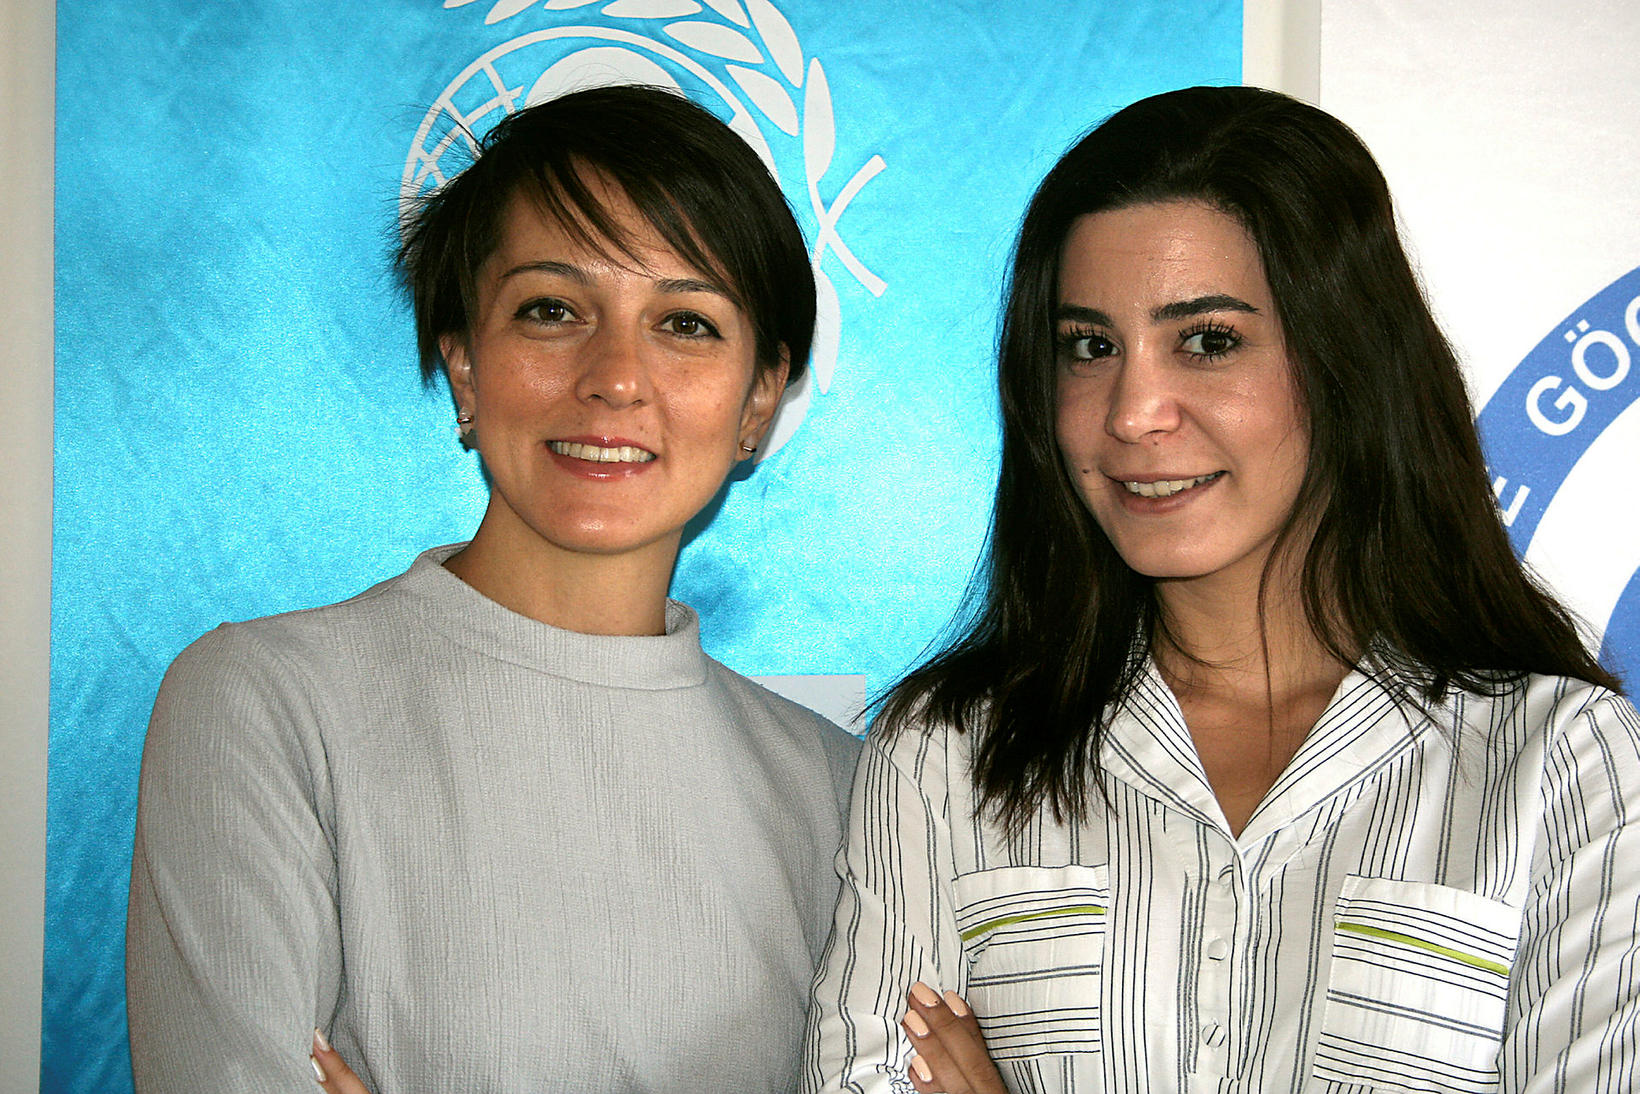 Sezen Yakin starfar hjá UNICEF í Gaziantep og Şuheda Kipri ...